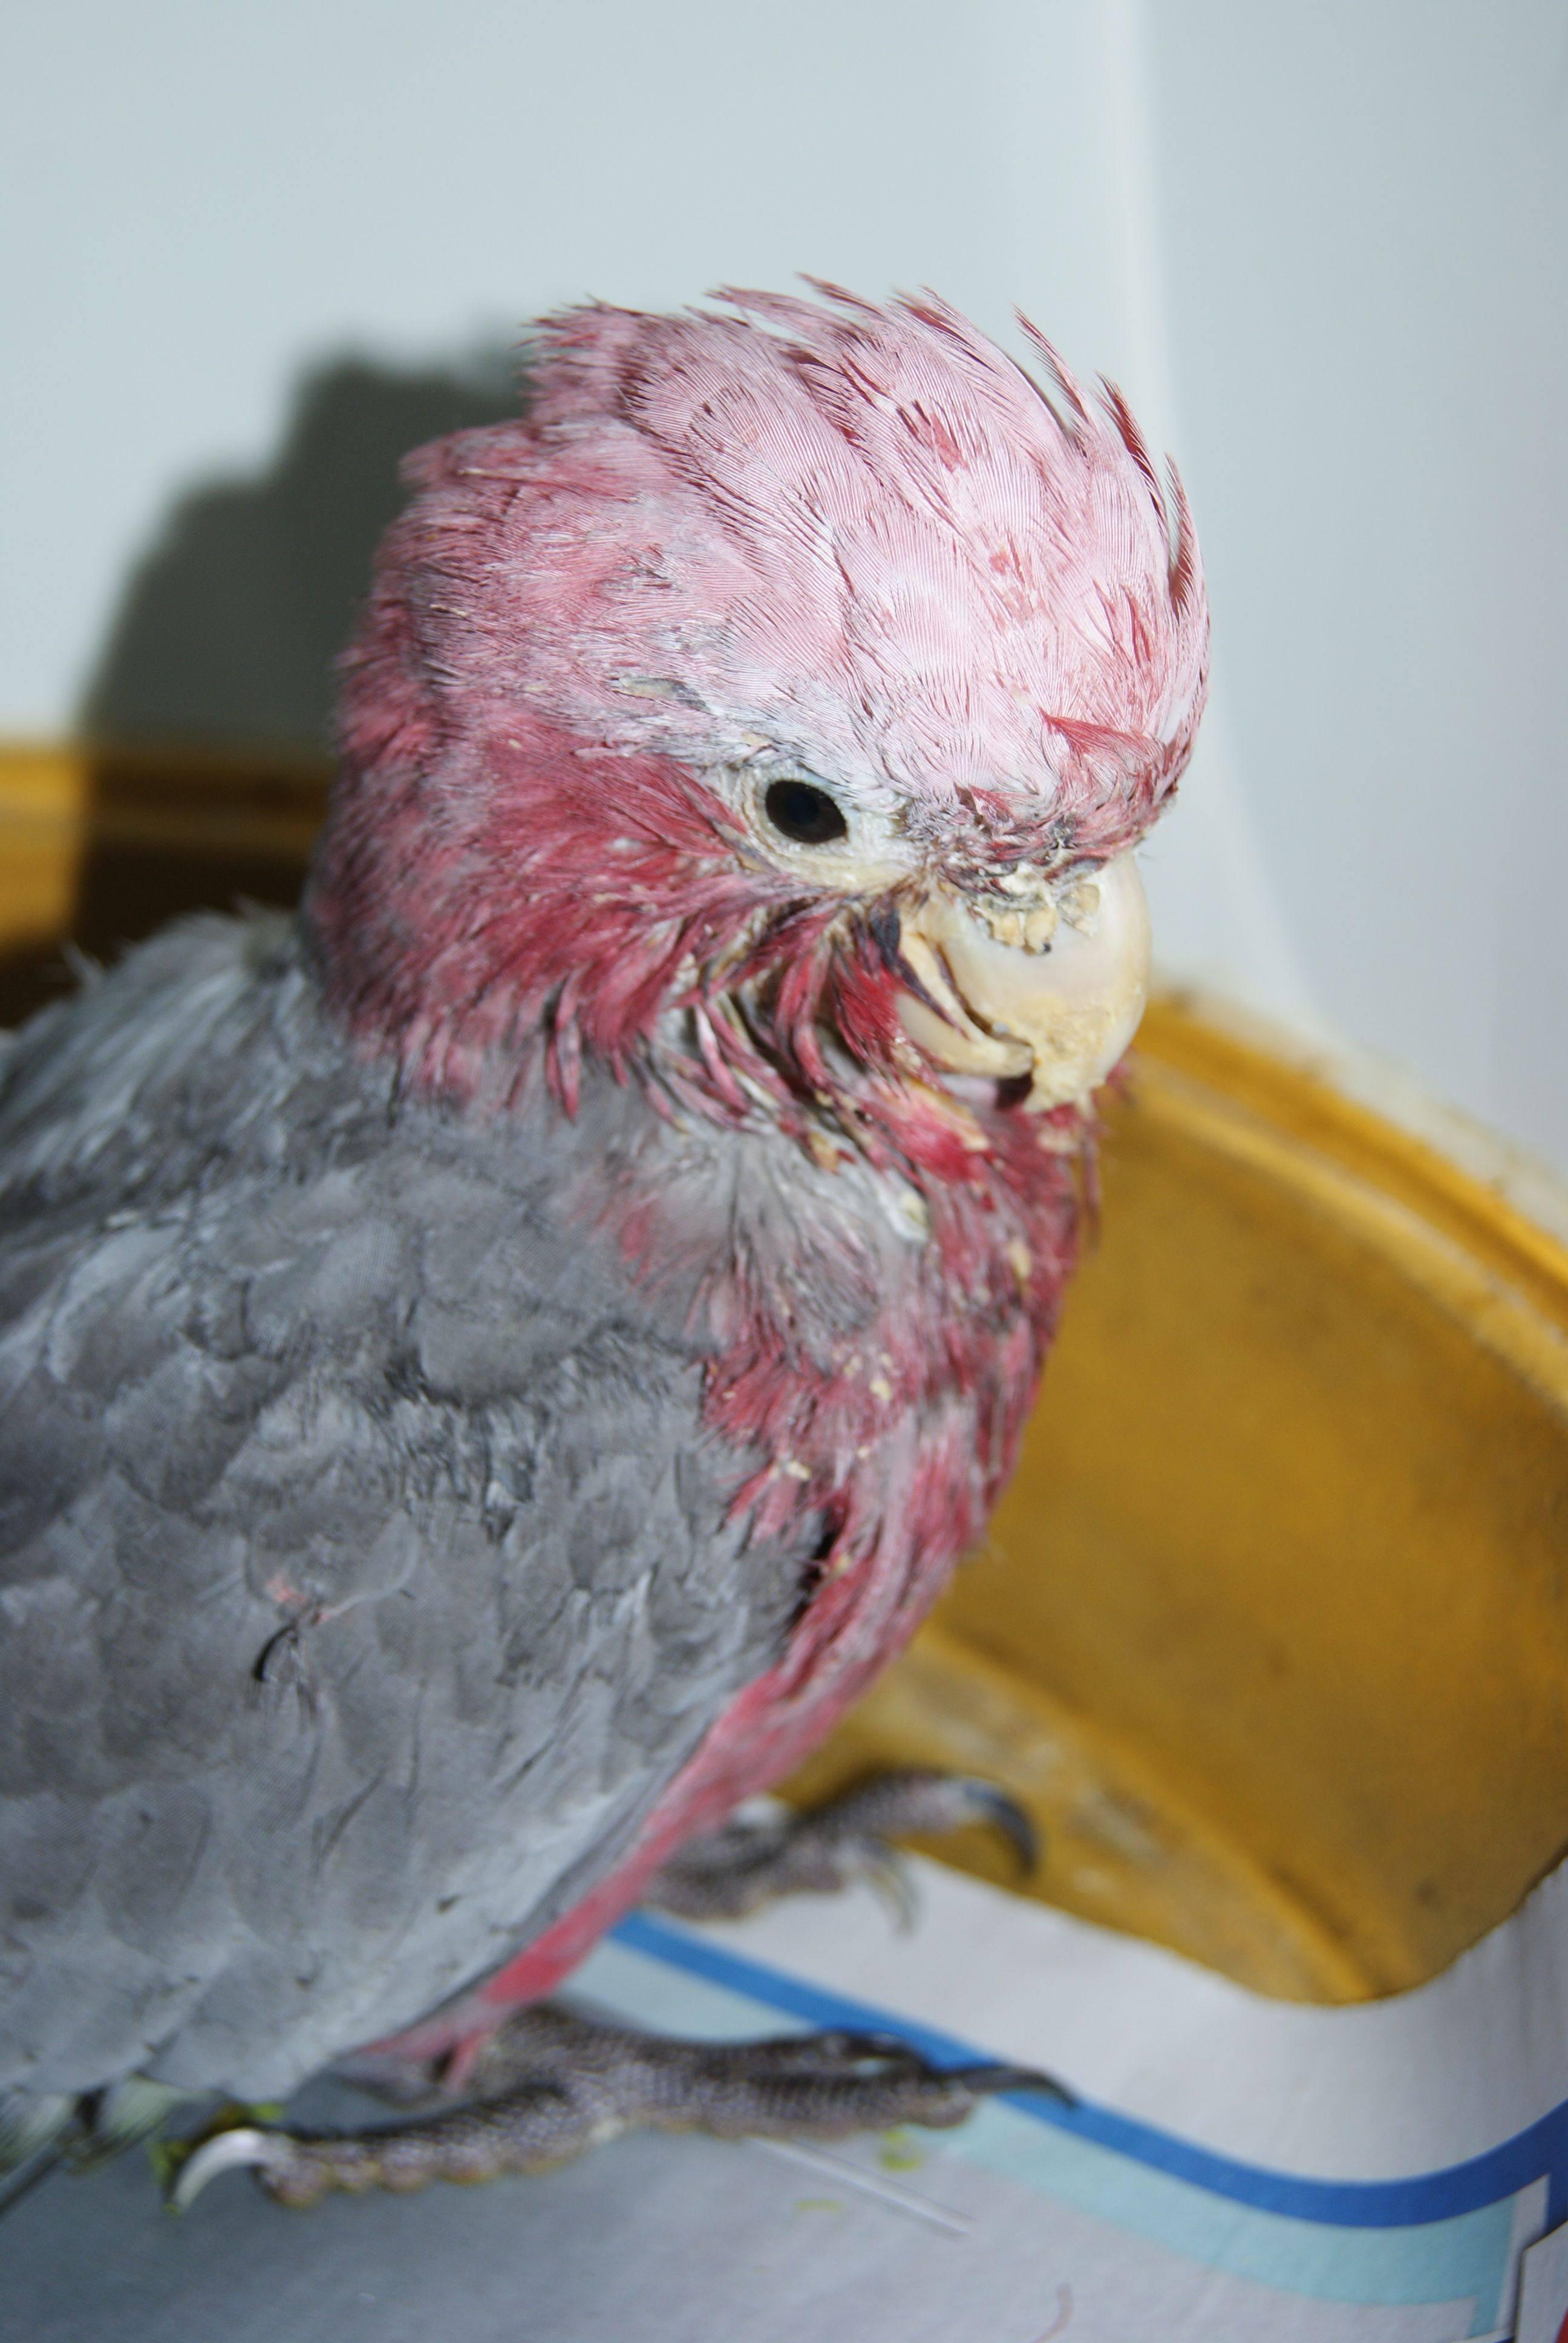 avian bird vet perth bird vet avian vet the unusual pet vets. Black Bedroom Furniture Sets. Home Design Ideas